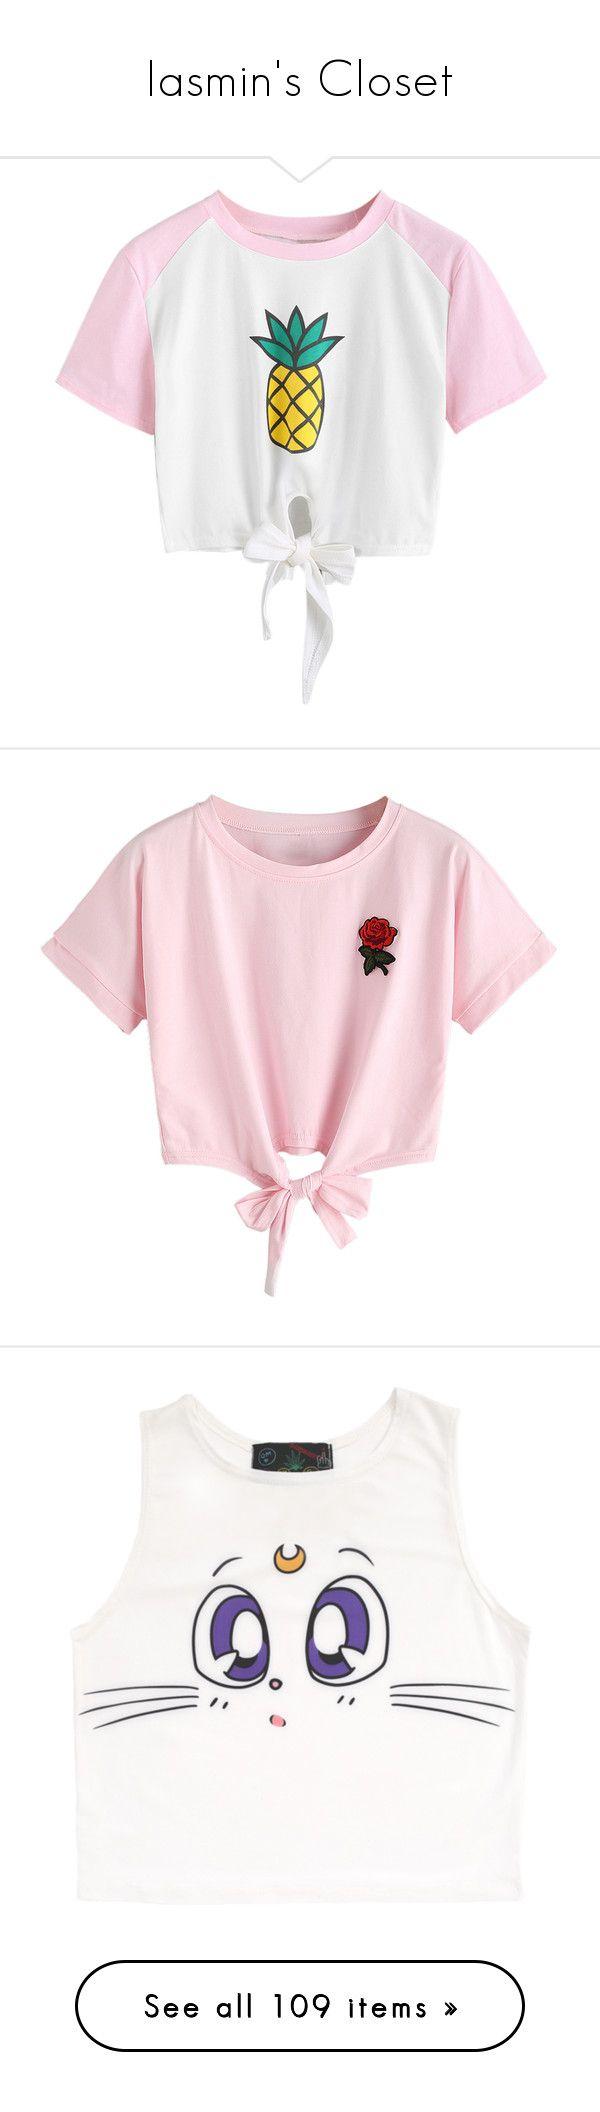 """Iasmin's Closet"" by anninhasanguinetti-435 ❤ liked on Polyvore featuring tops, t-shirts, shirts, white crop shirt, pineapple t shirt, white cotton shirt, raglan shirts, raglan t shirt, crop top and pink short sleeve shirt"